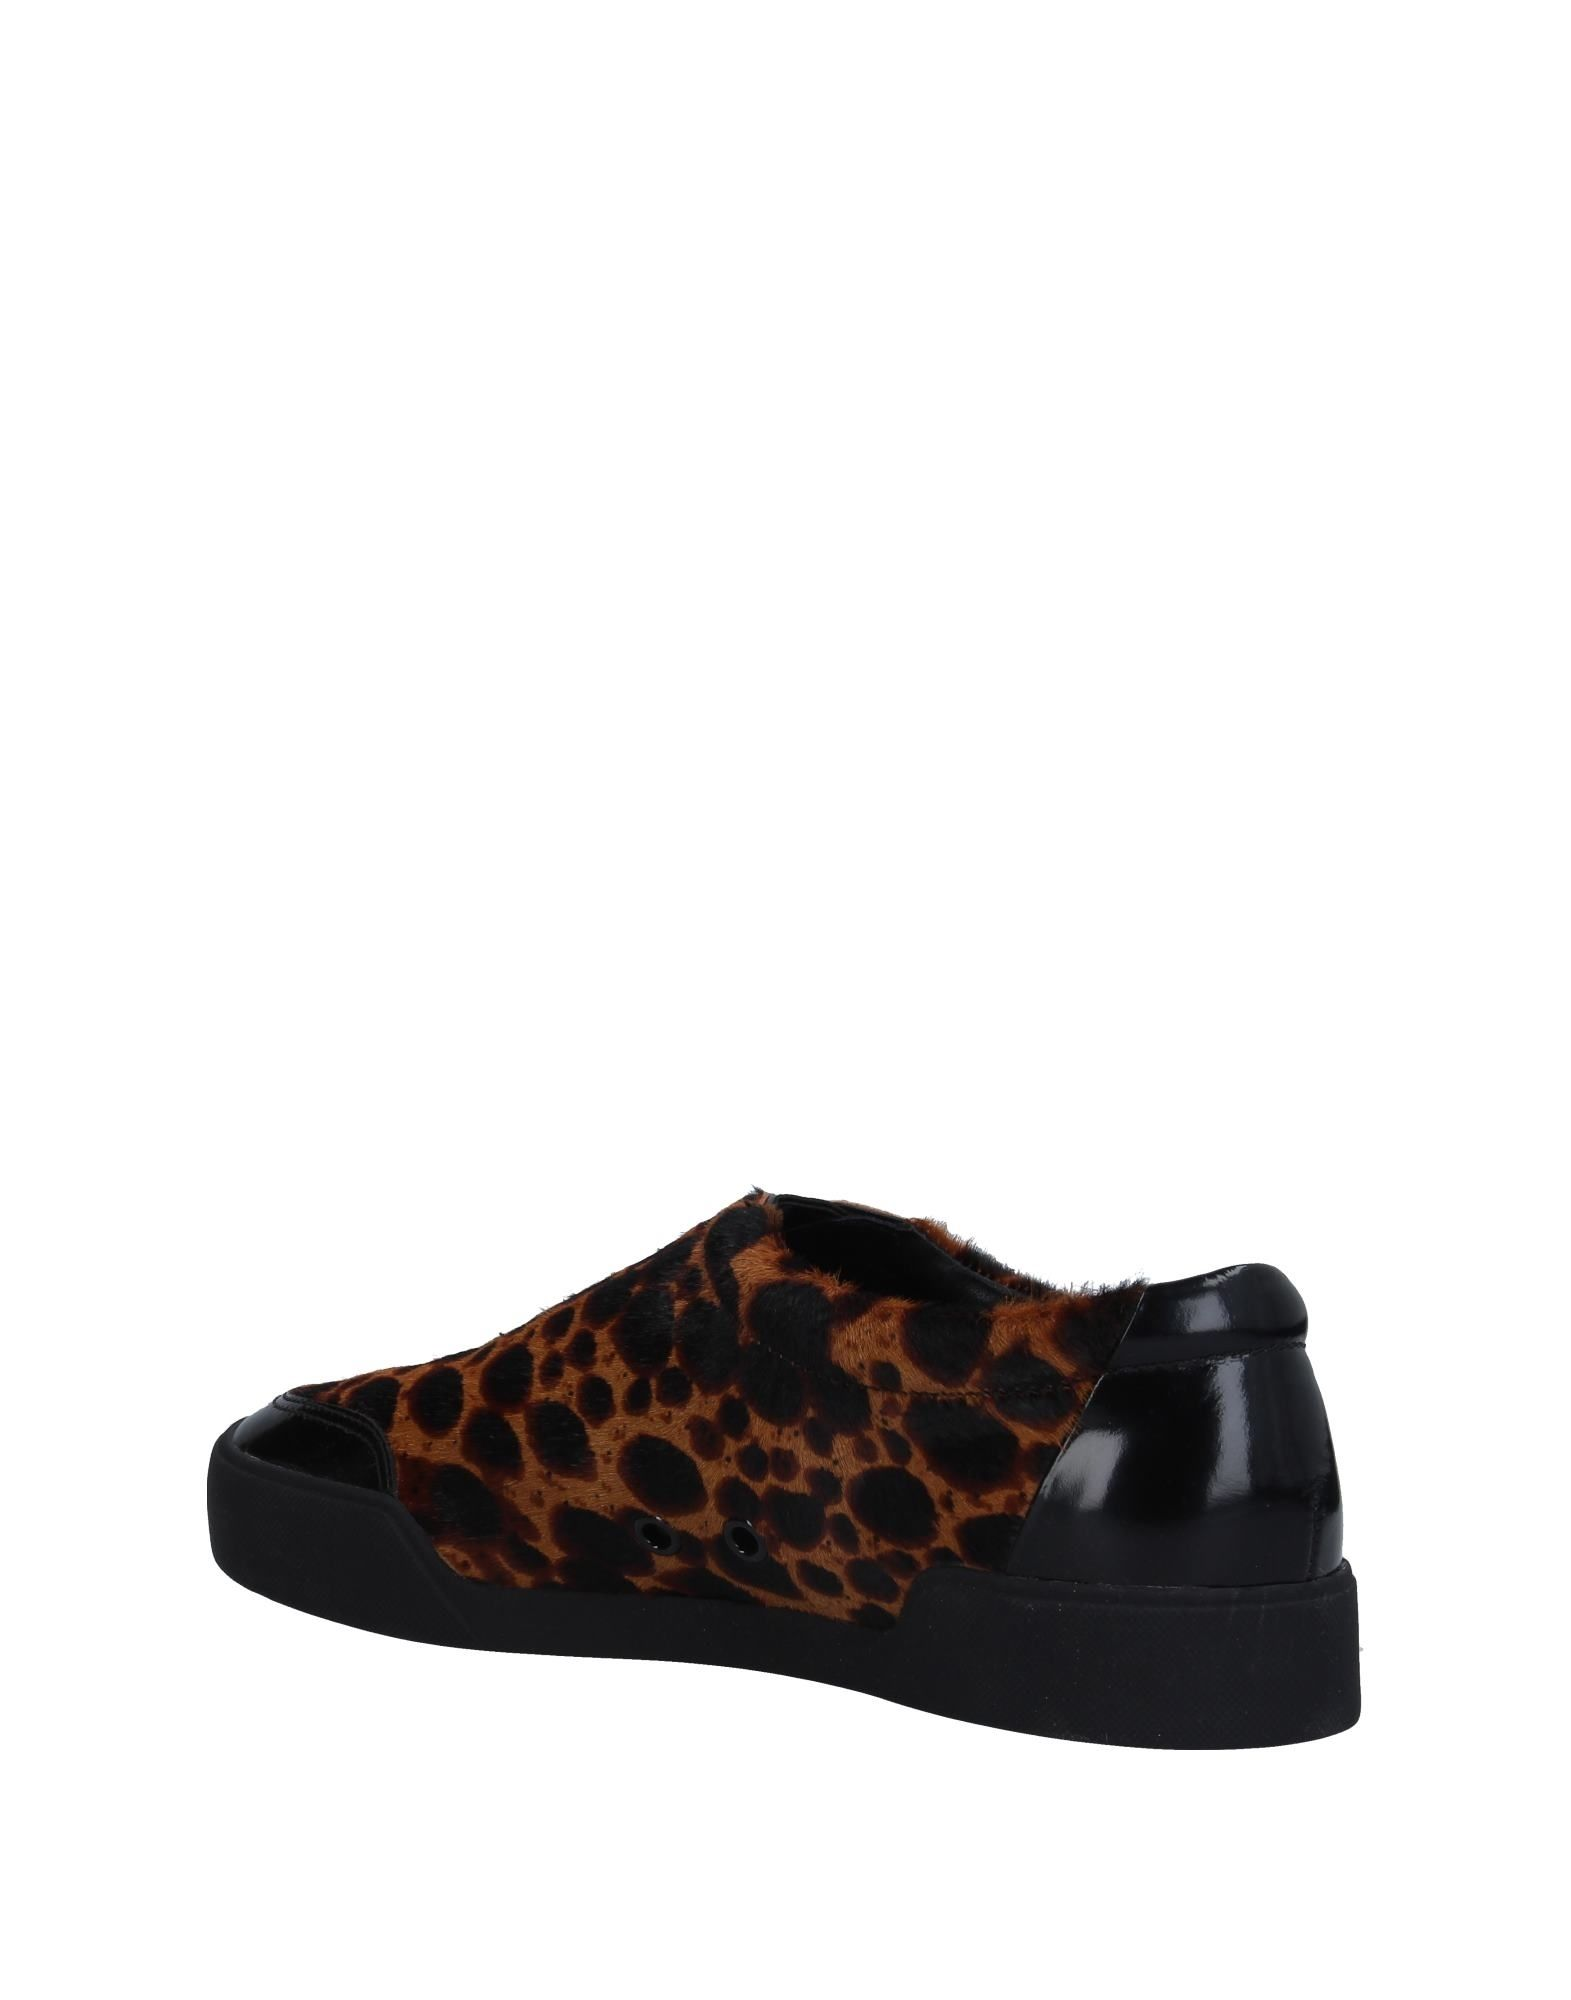 Sneakers 3.1 Phillip Lim Femme - Sneakers 3.1 Phillip Lim sur